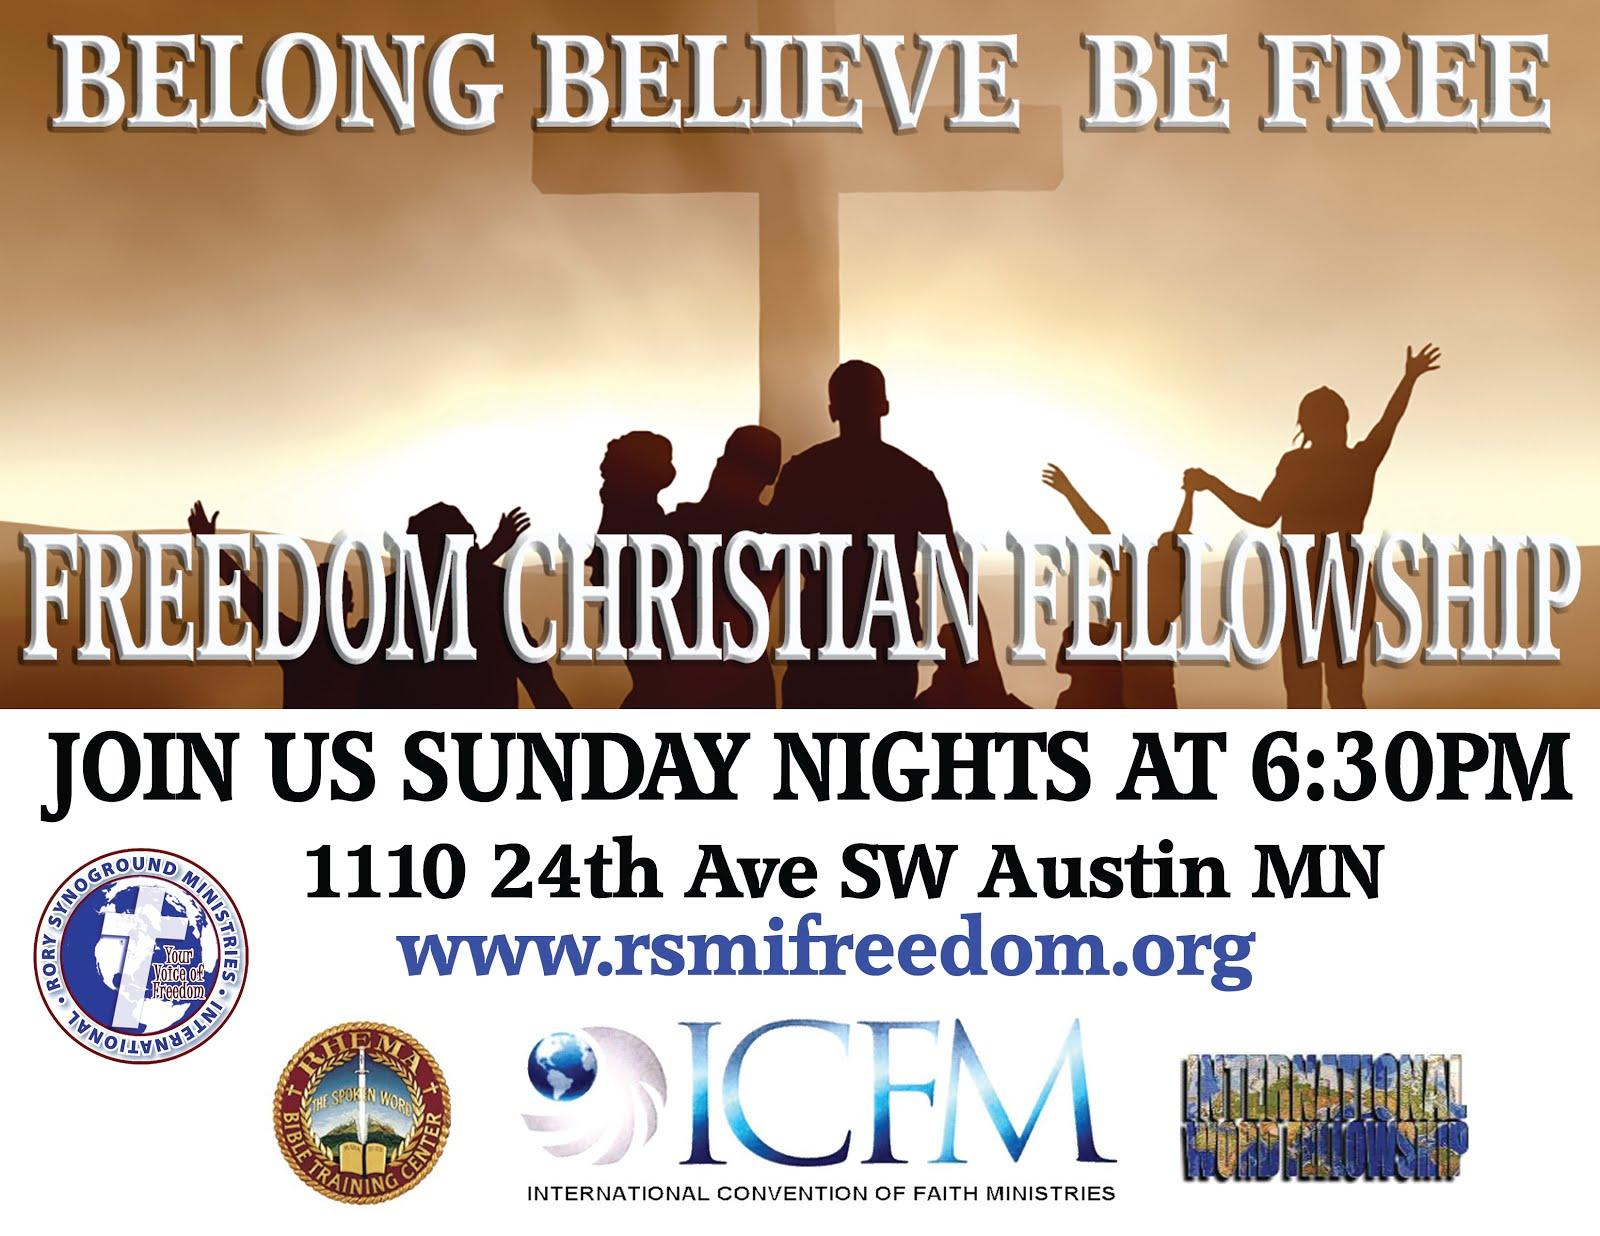 FREEDOM CHRISTIAN FELLOWSHIP